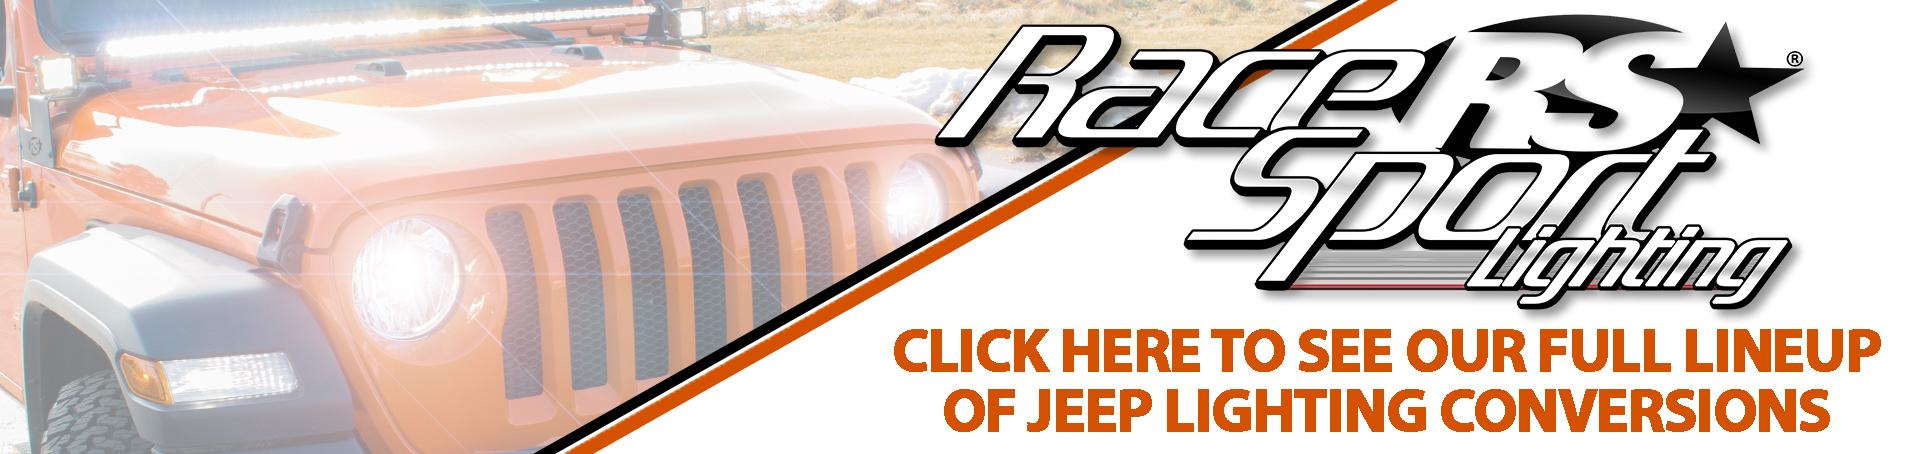 Jeep Lighting Conversion